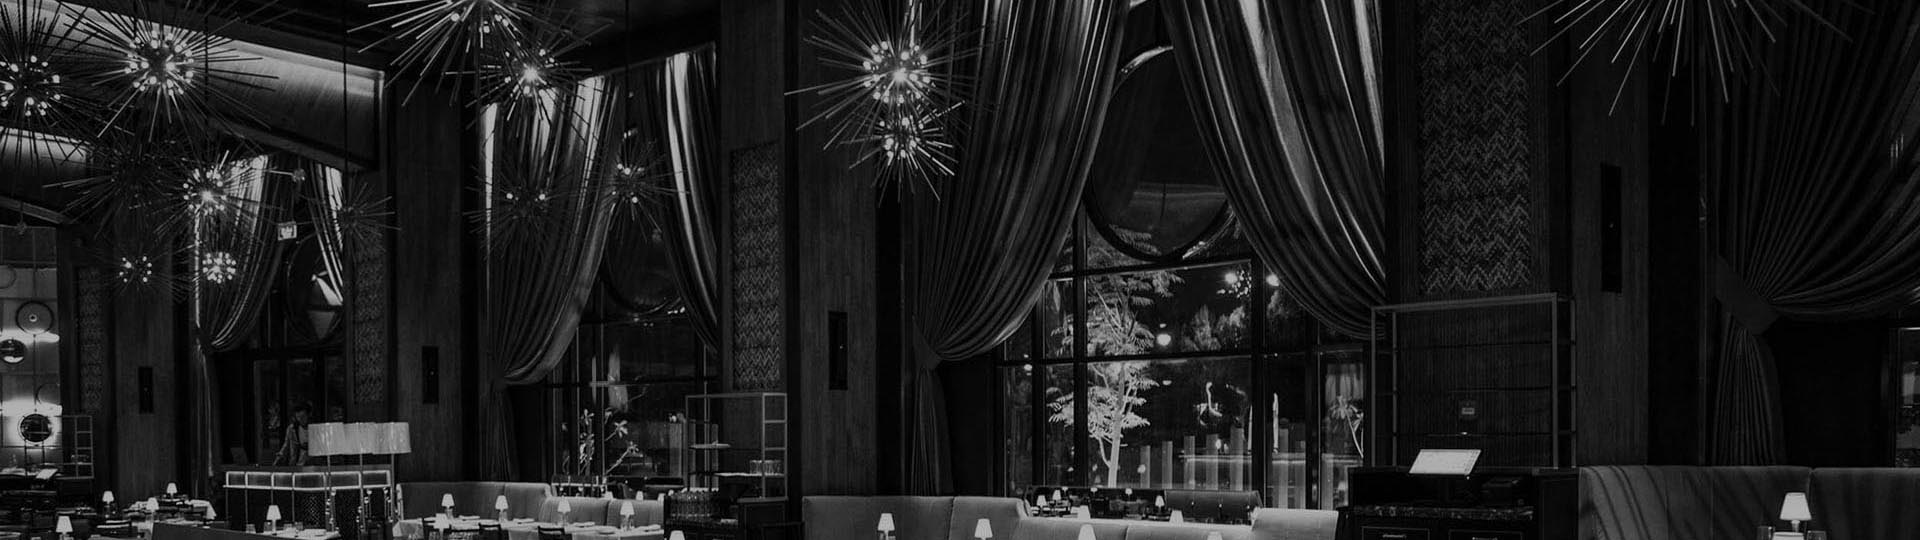 11-Billionaire_Riyadh_By_Storm_Design_Studio-2